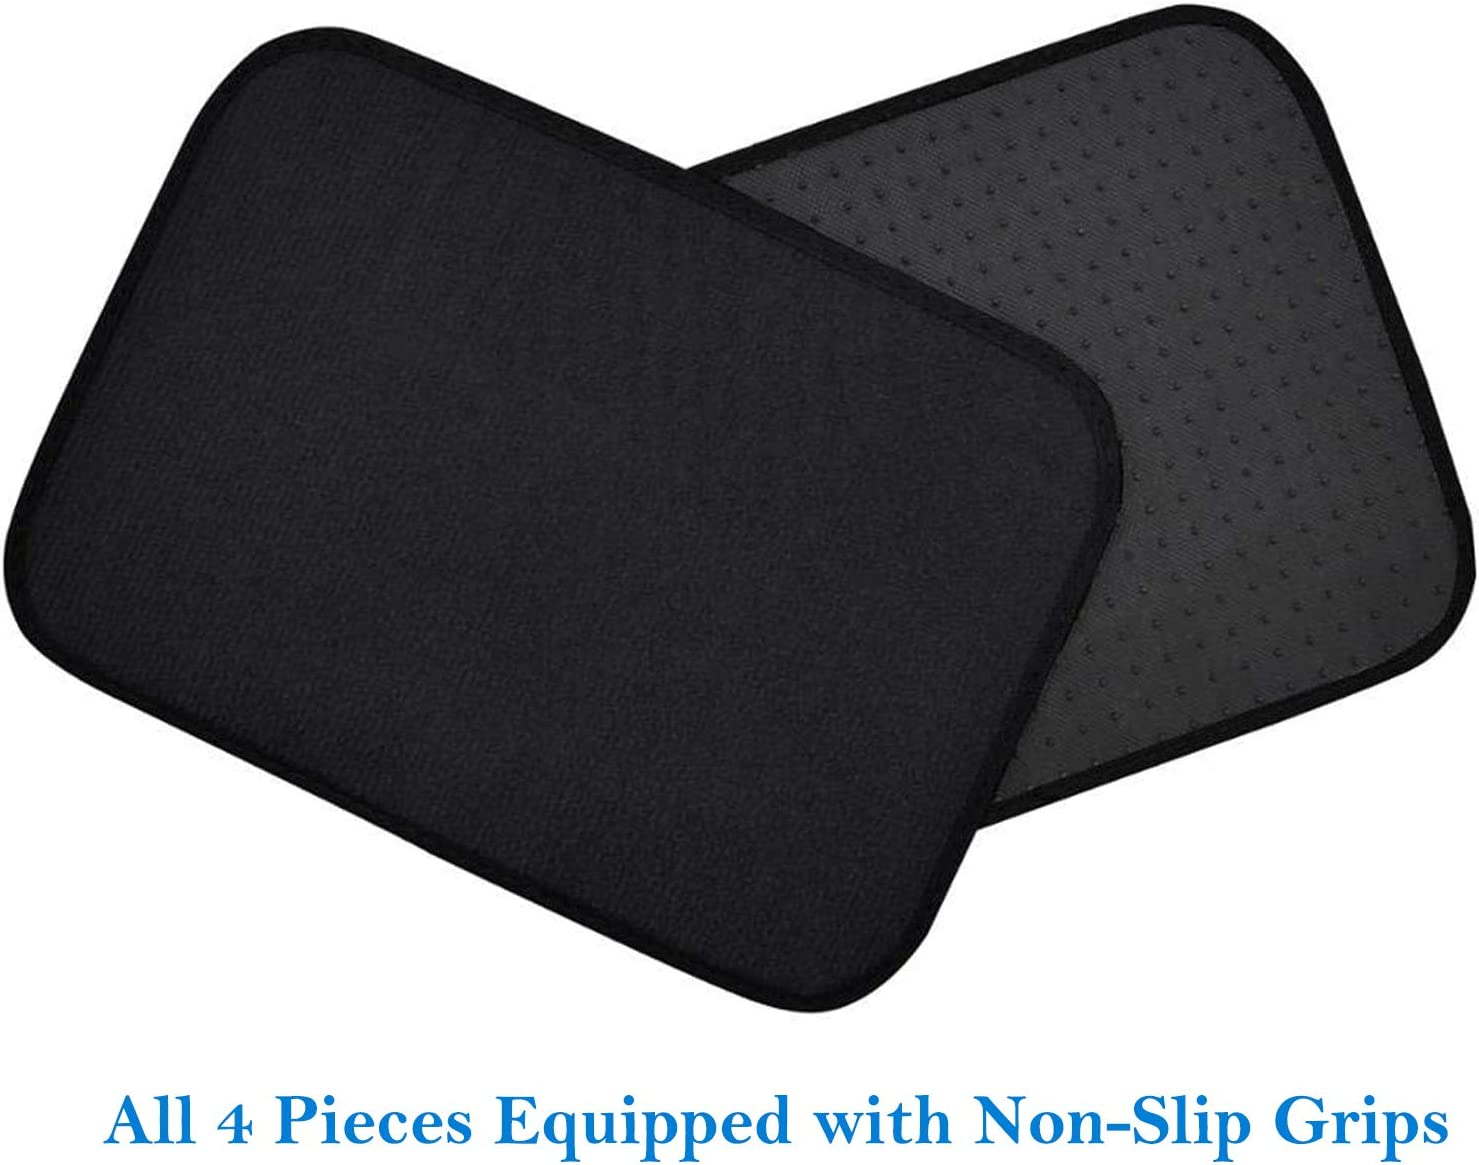 4 Piece Car Mat Universal Non-Slip for Cars SUV Truck and VAN Black Carpet